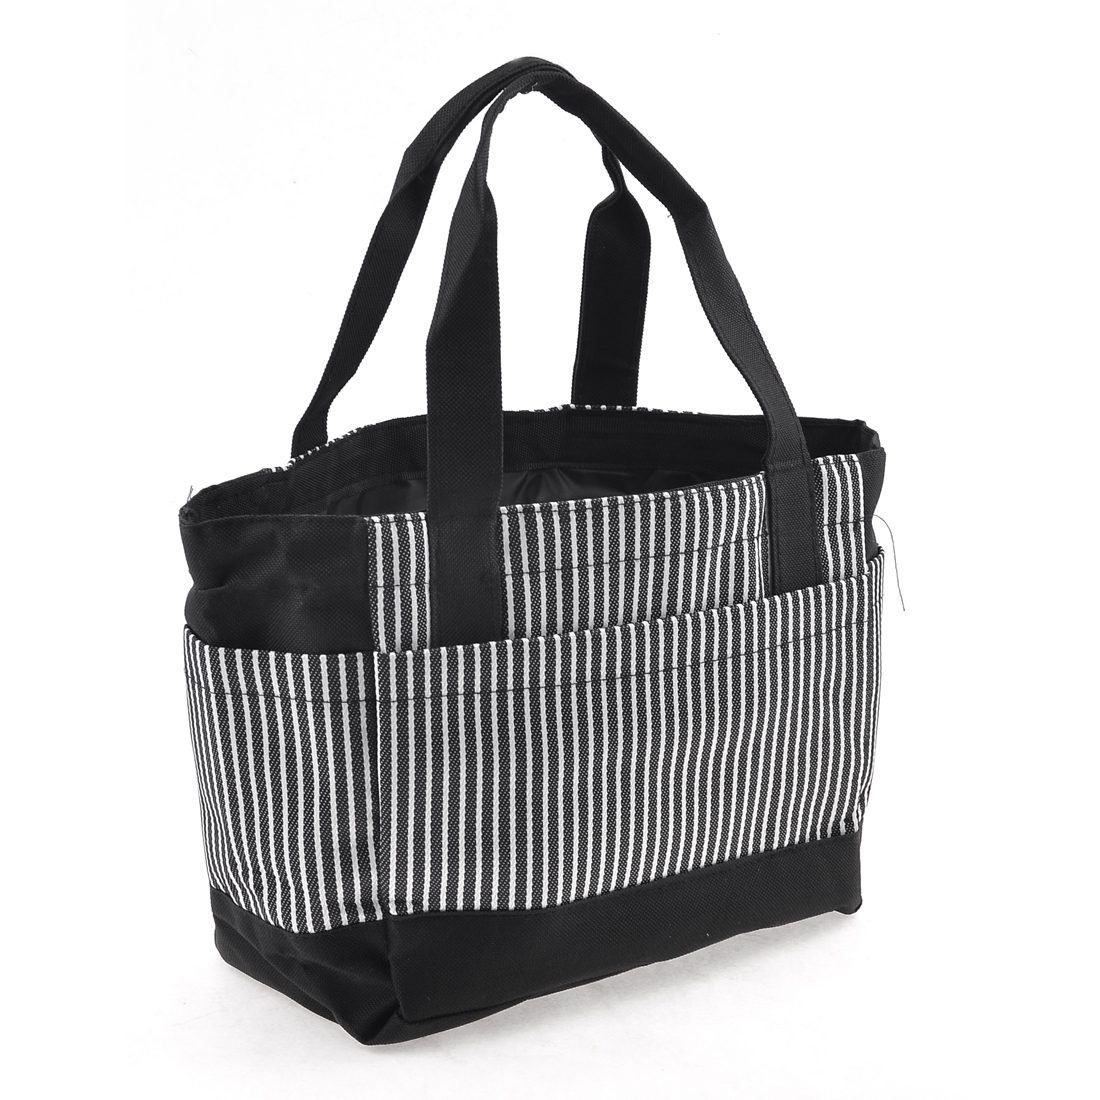 Ladies Stripes Pattern Nylon Shopping Handbag Black White